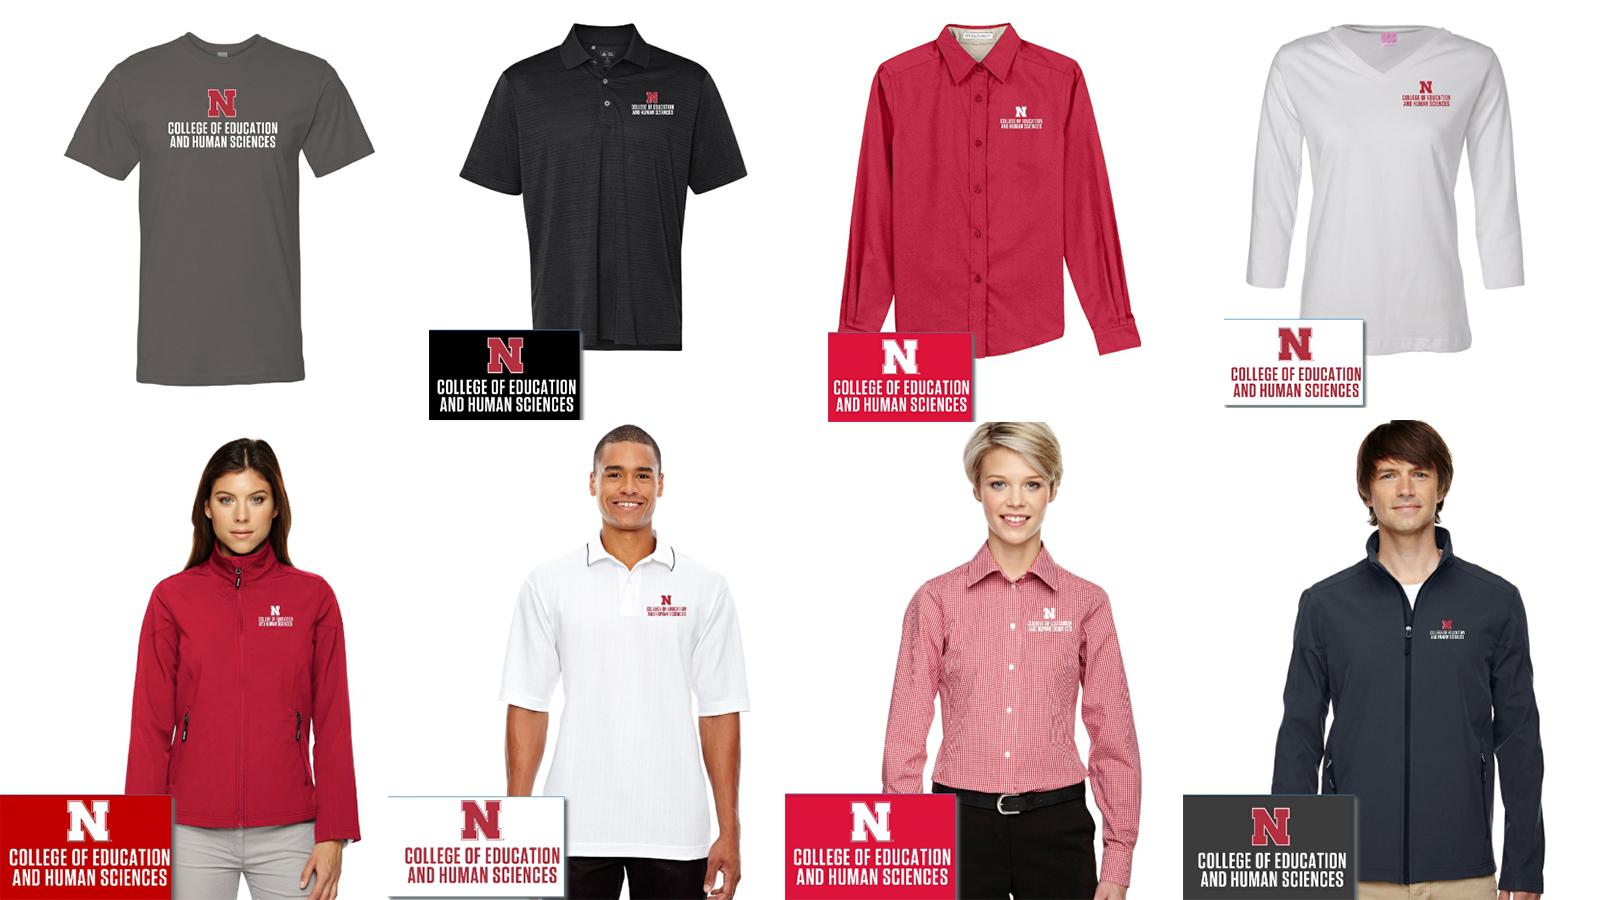 Order CEHS apparel online at http://go.unl.edu/gocehs.